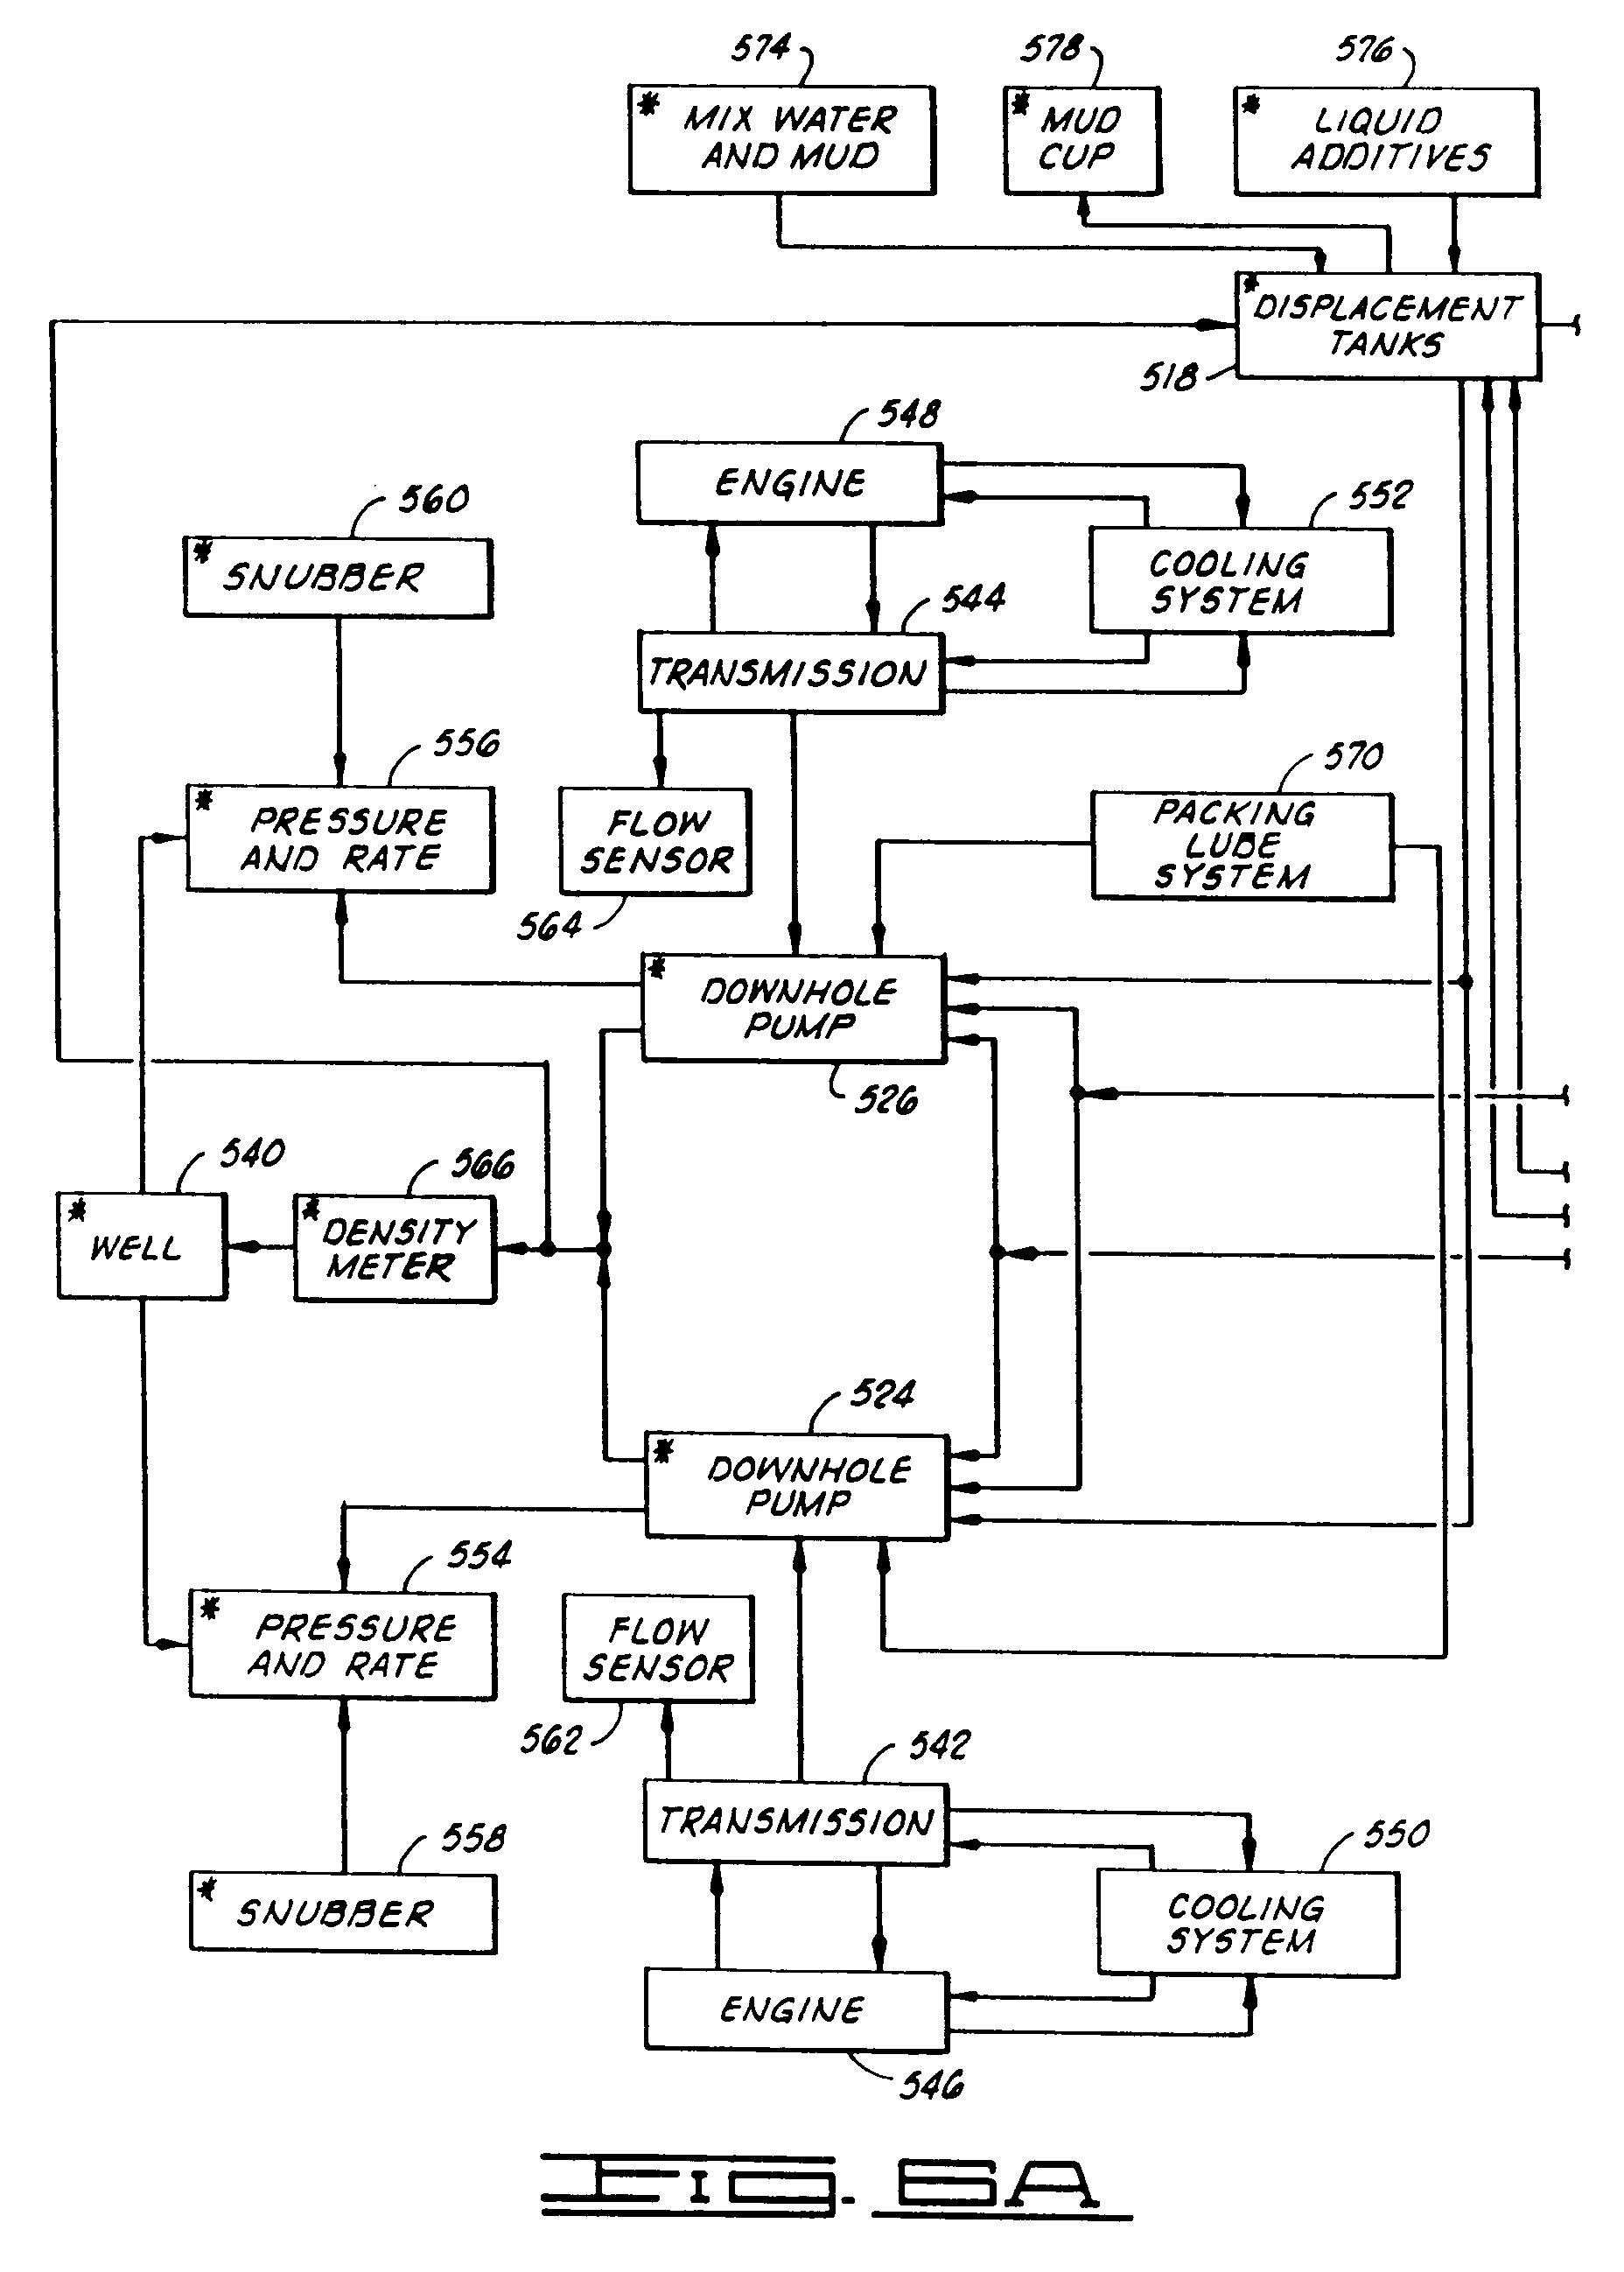 Cat Jake Brake Wiring Great Design Of Diagram C12 C10 Caterpillar Engine Parts Diagrams Free 3406b C15